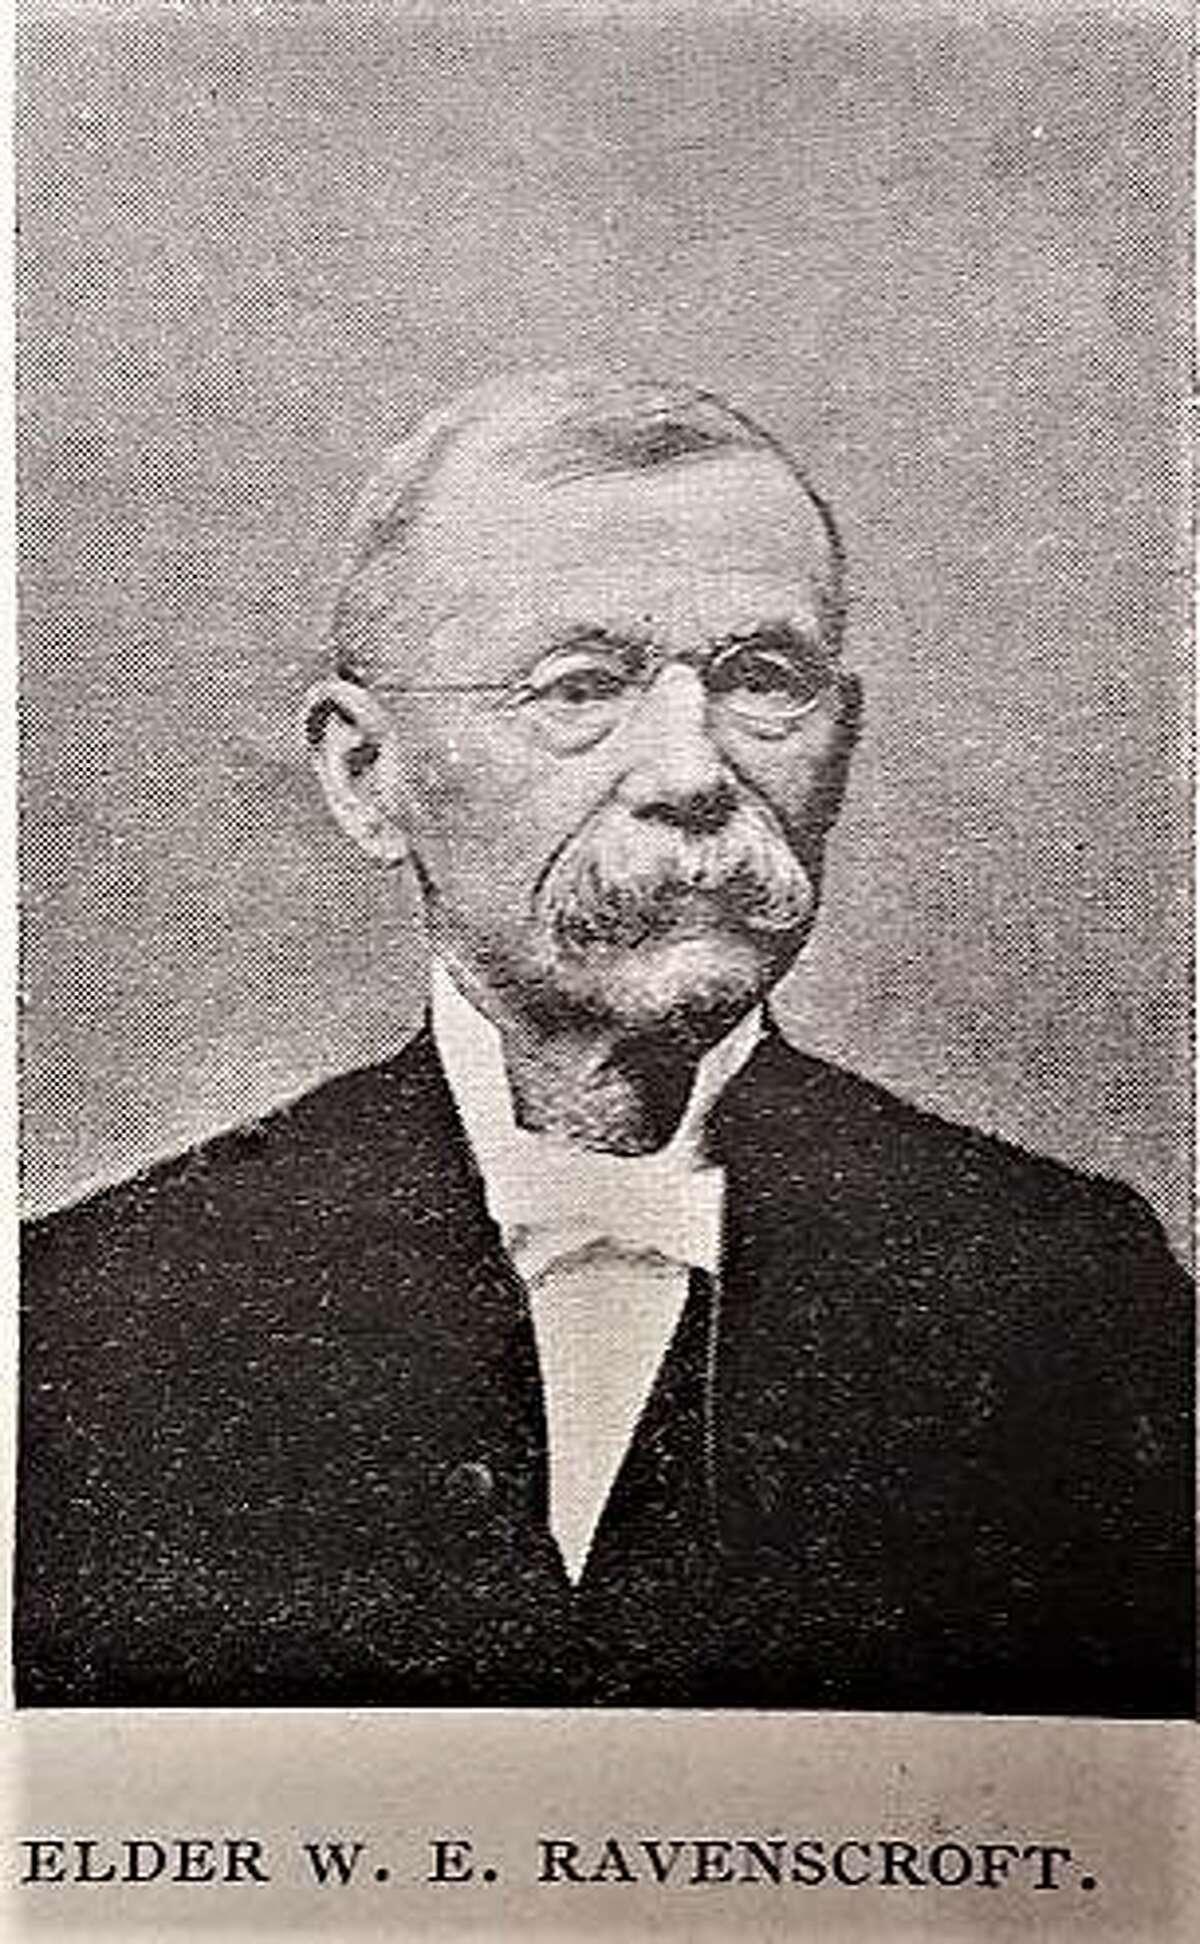 An 1895 Edwardsville Intelligencer file photo pictures Rev. William Ravenscroft.